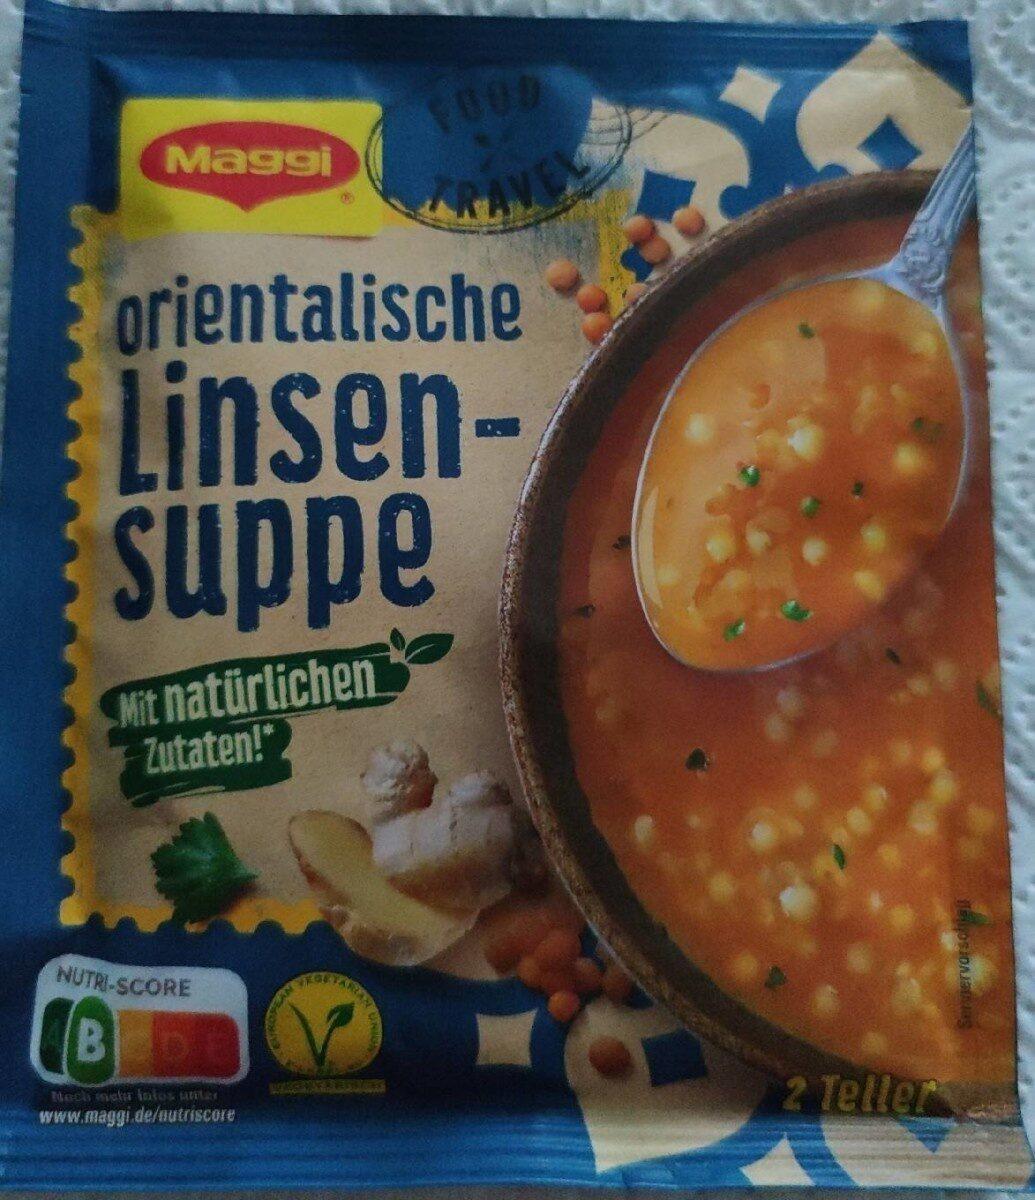 Orientalische Linsen-Suppe (Vegetarisch) - Produkt - de